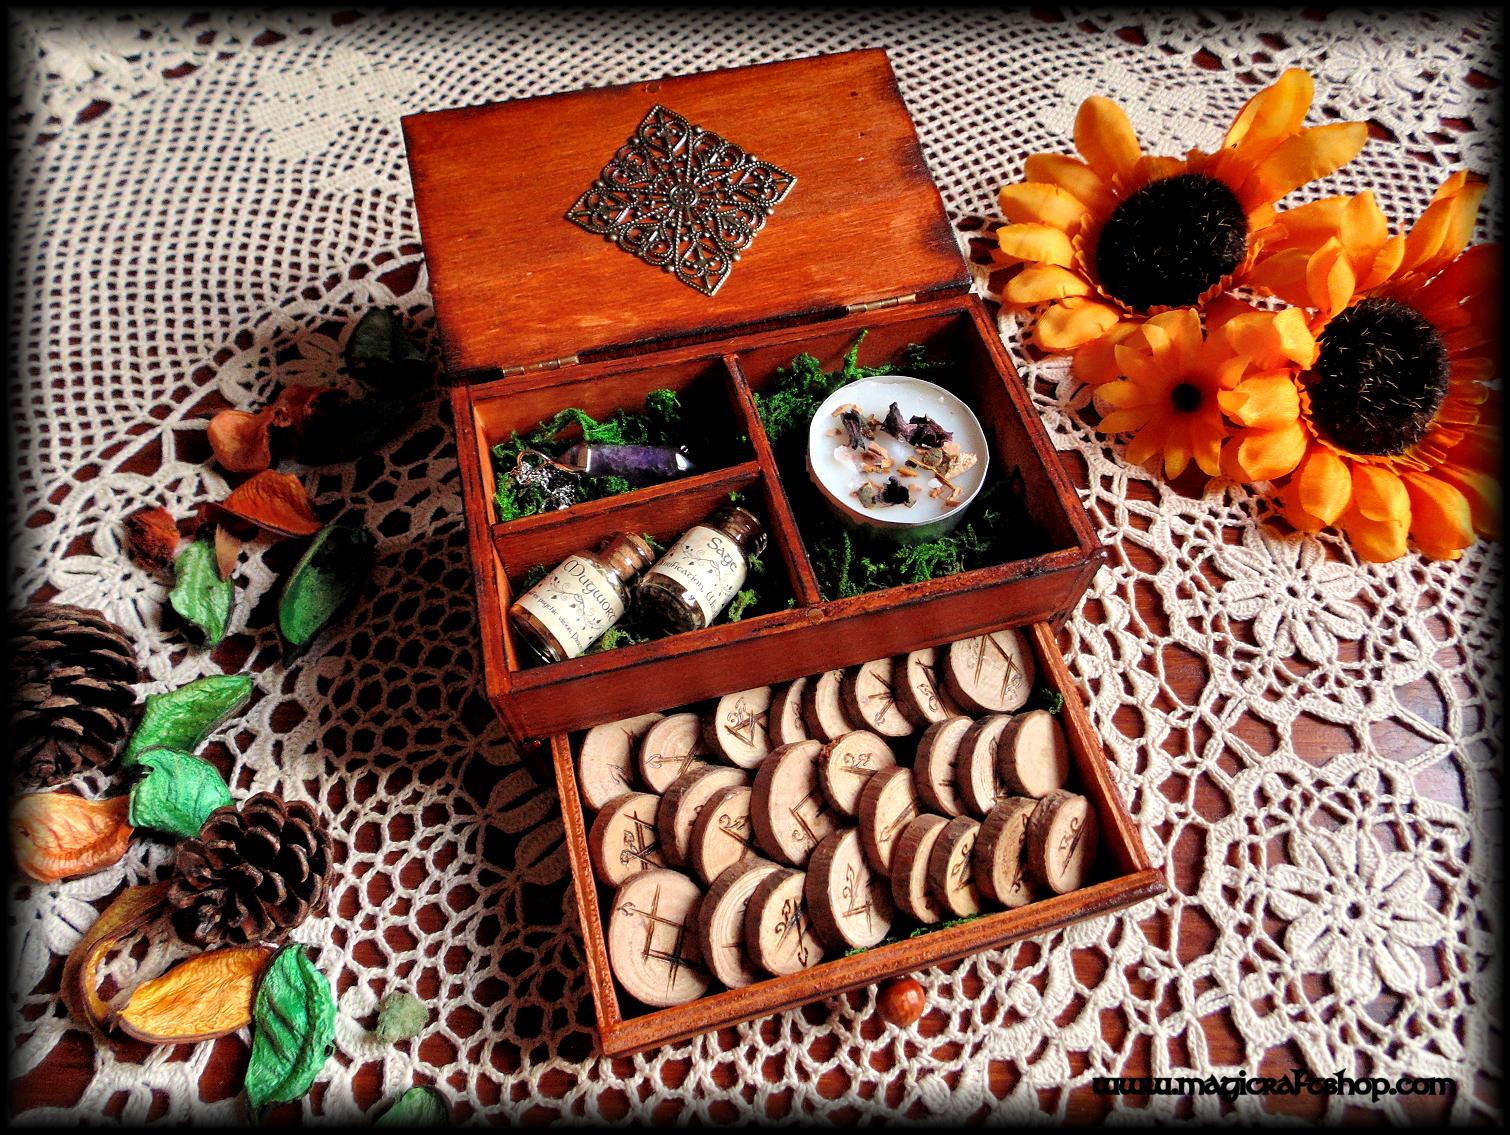 Divination kit